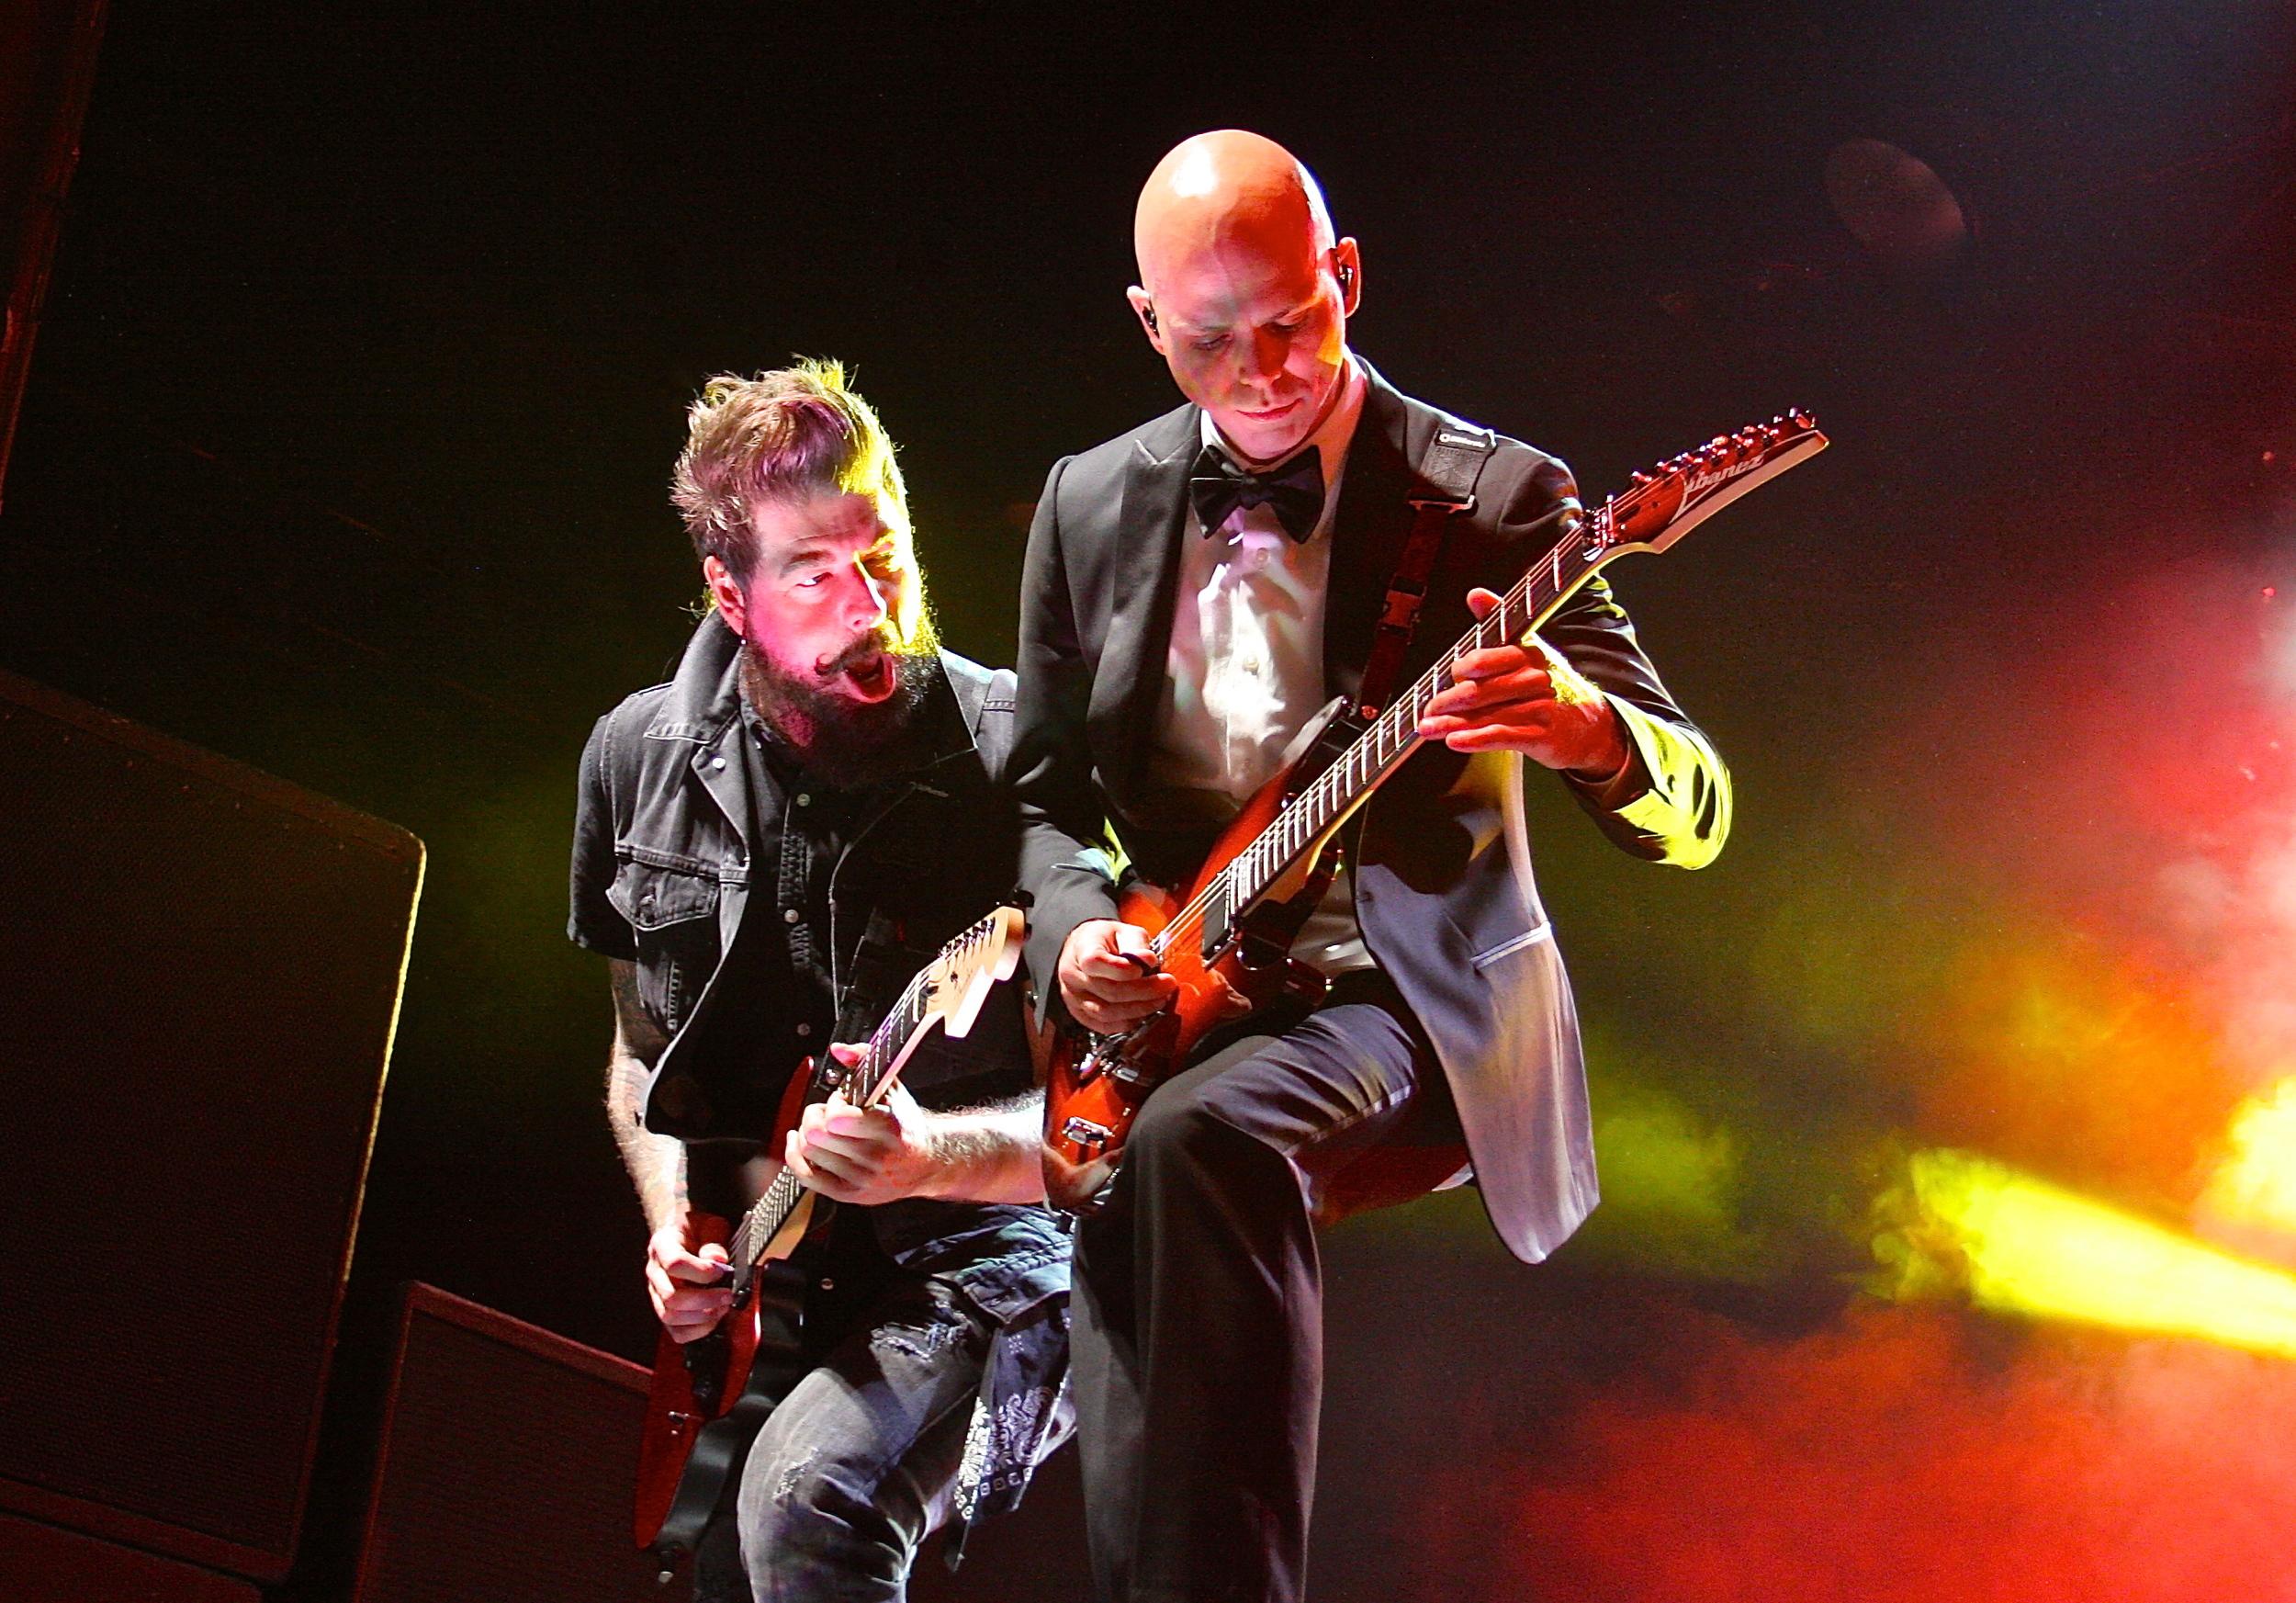 Stone Sour rocking the crowd (Photo Credit: David Burke)